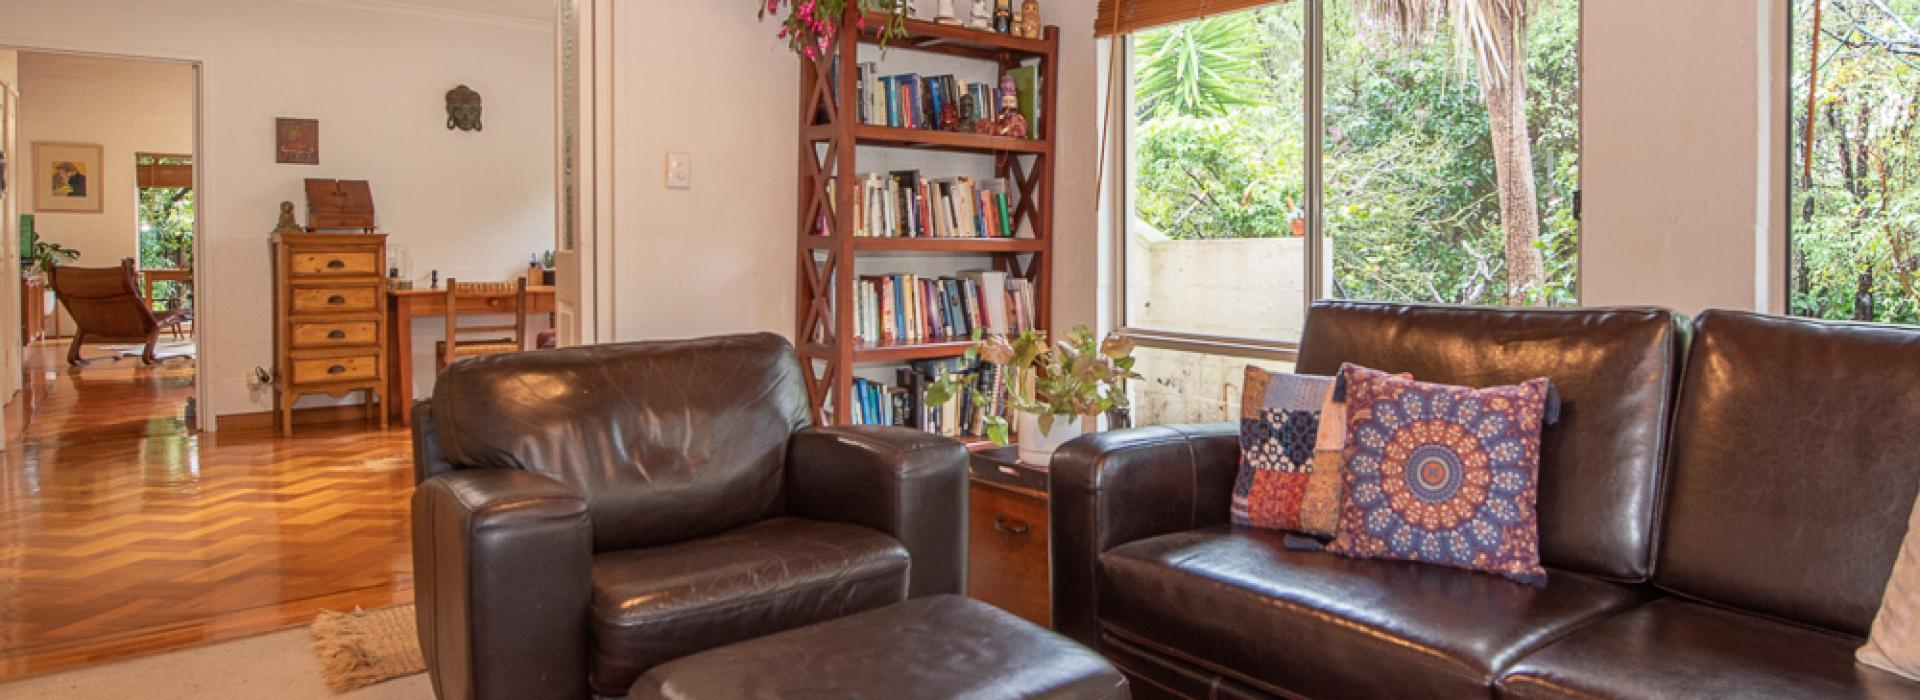 Flanagan Residential   For Sale   Rae Smith   Trevallyn